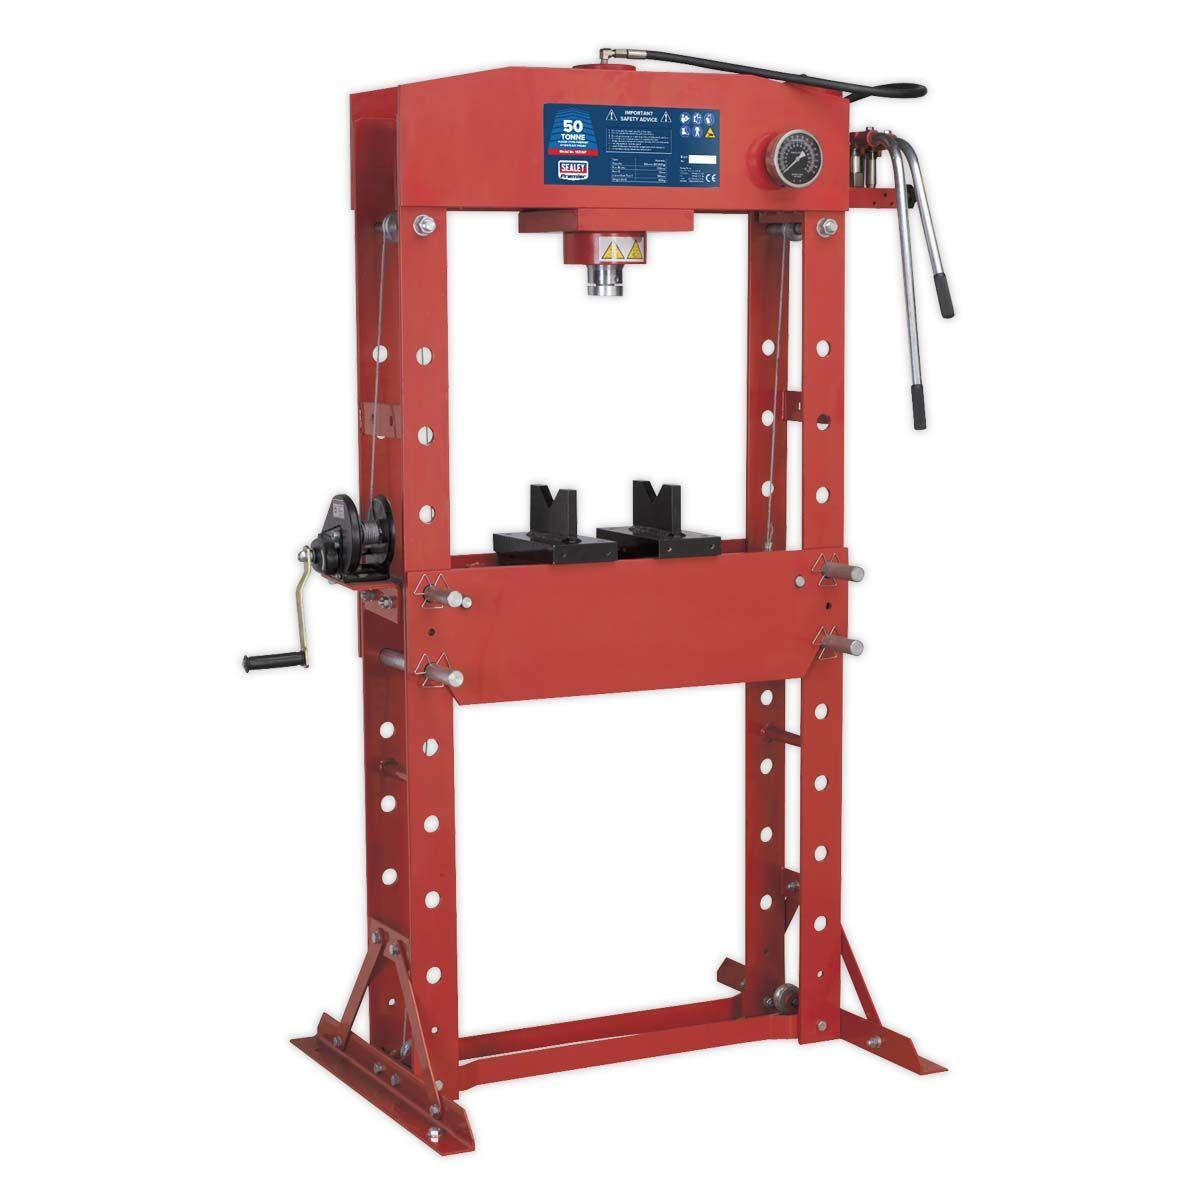 Sealey Hydraulic Press 50tonne Floor Type